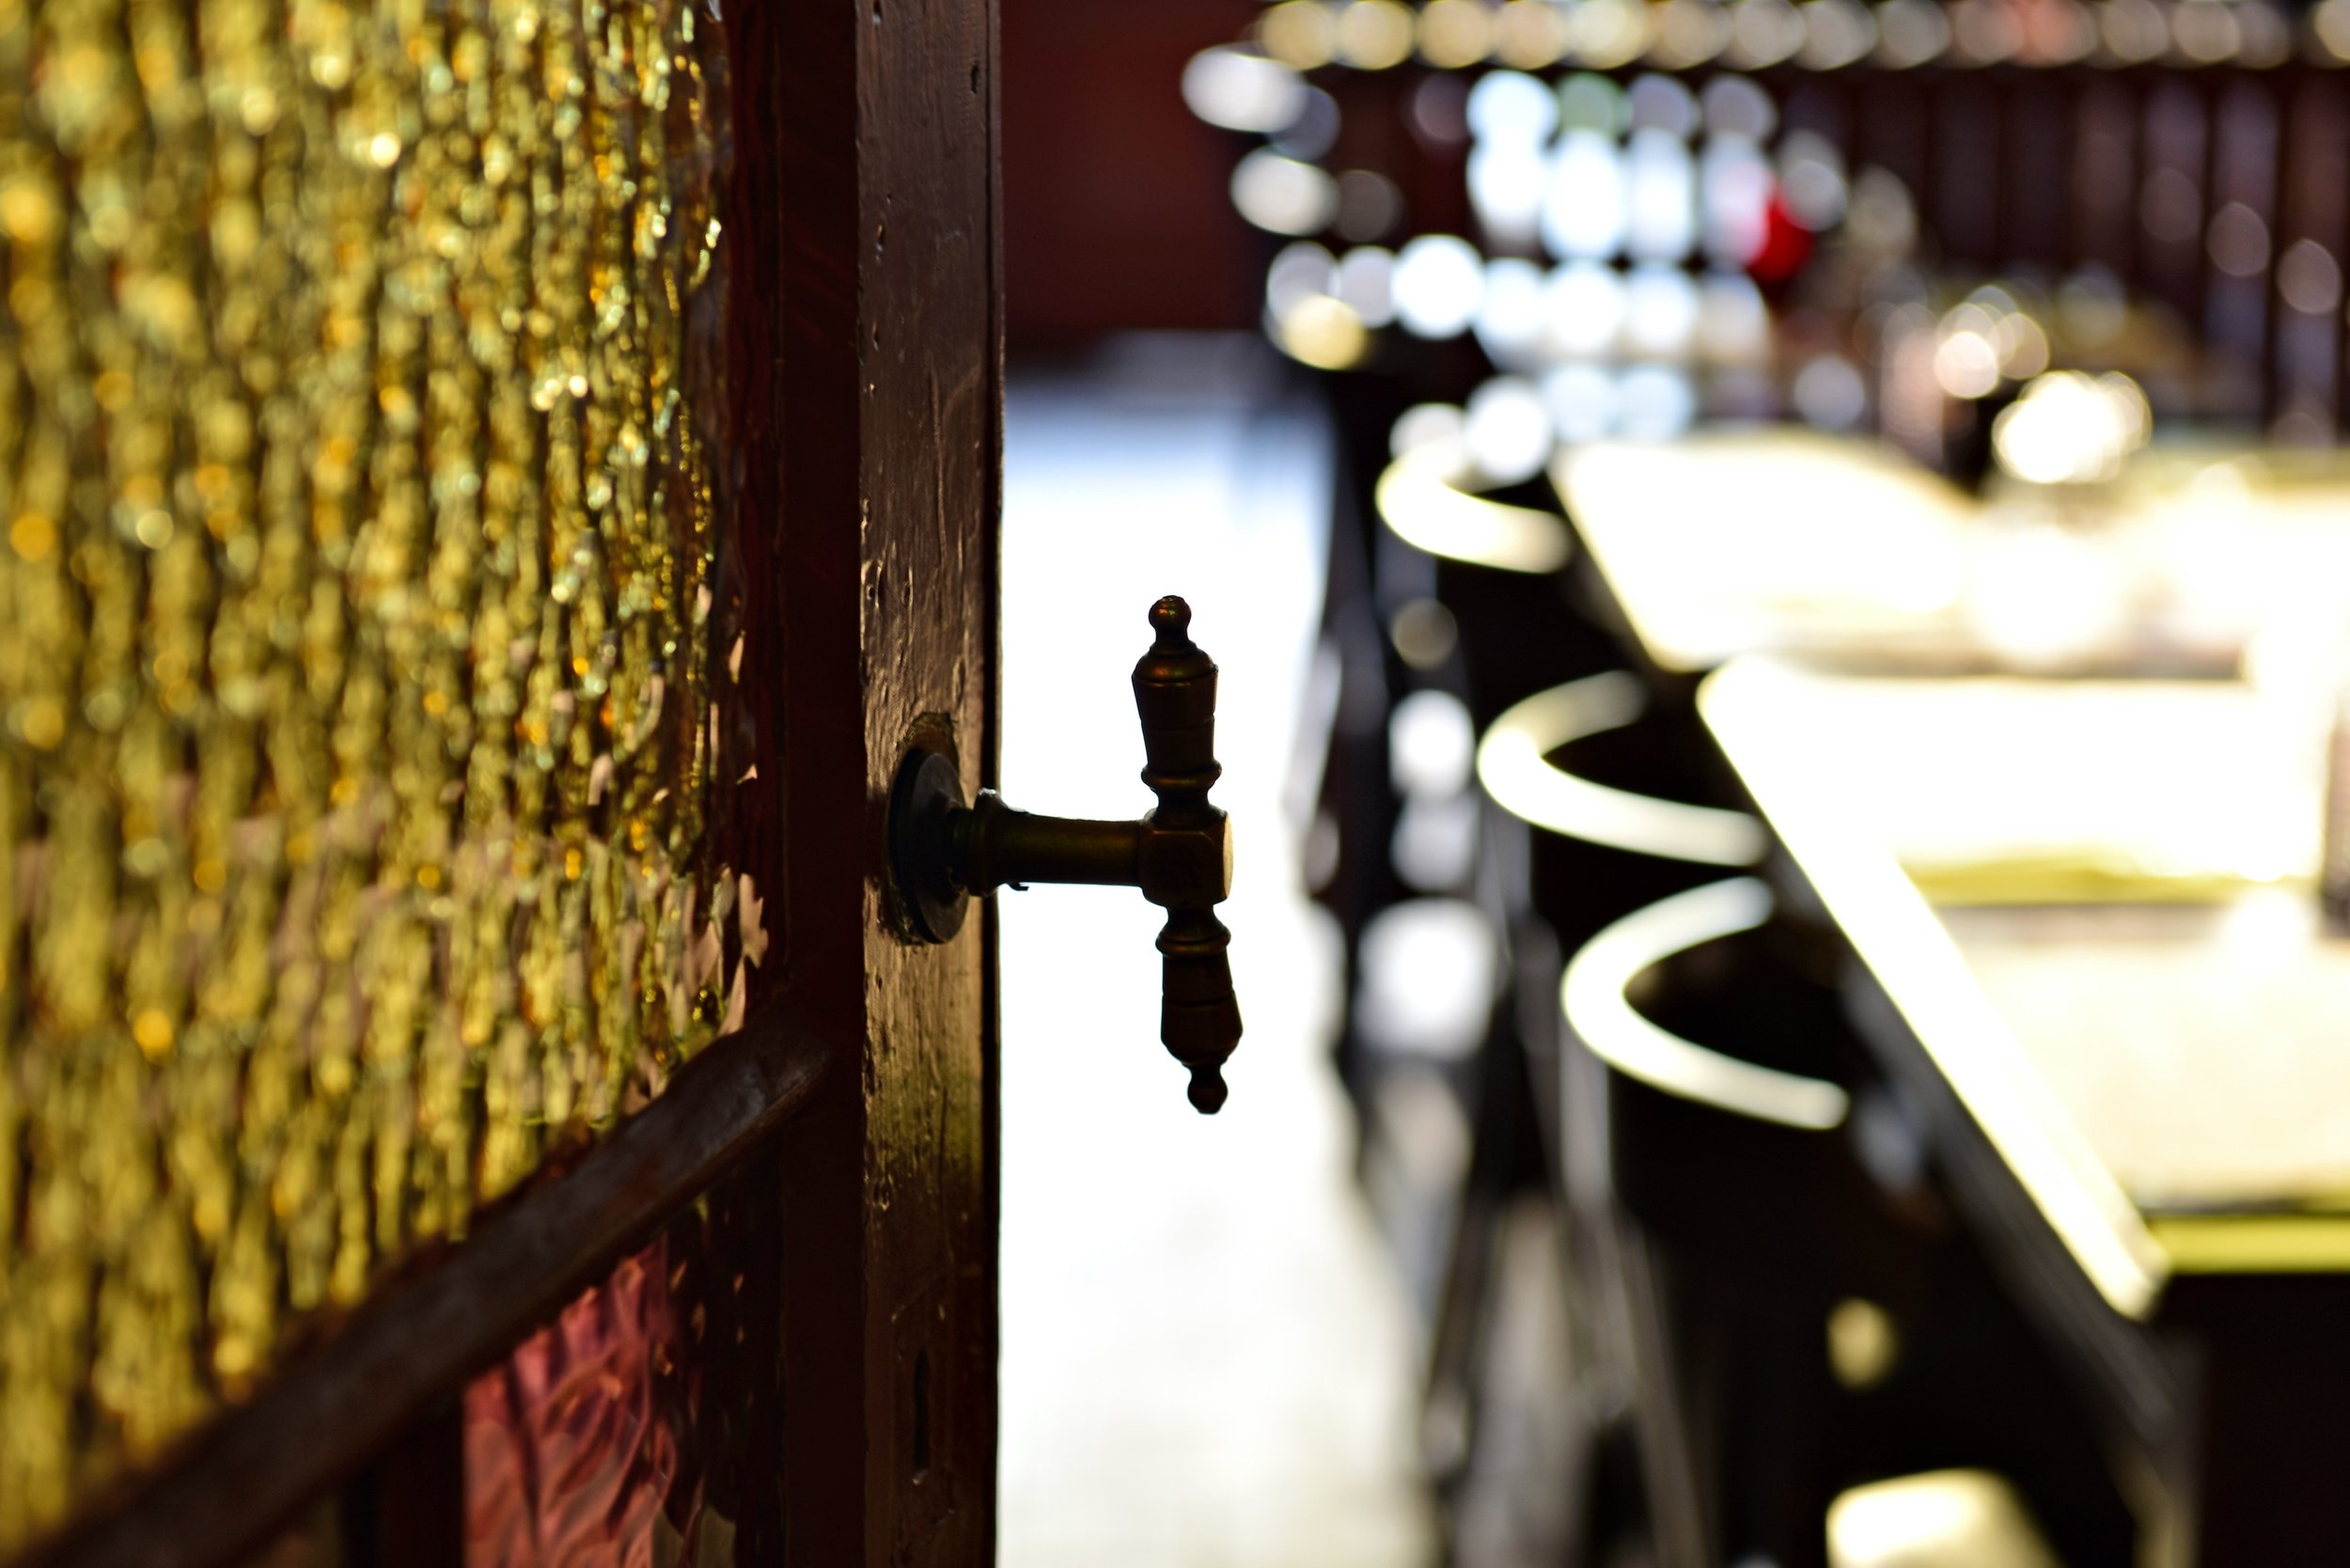 5 la pipe d anvers antwerpen brasserie antwerp best restaurant tablefever.jpg